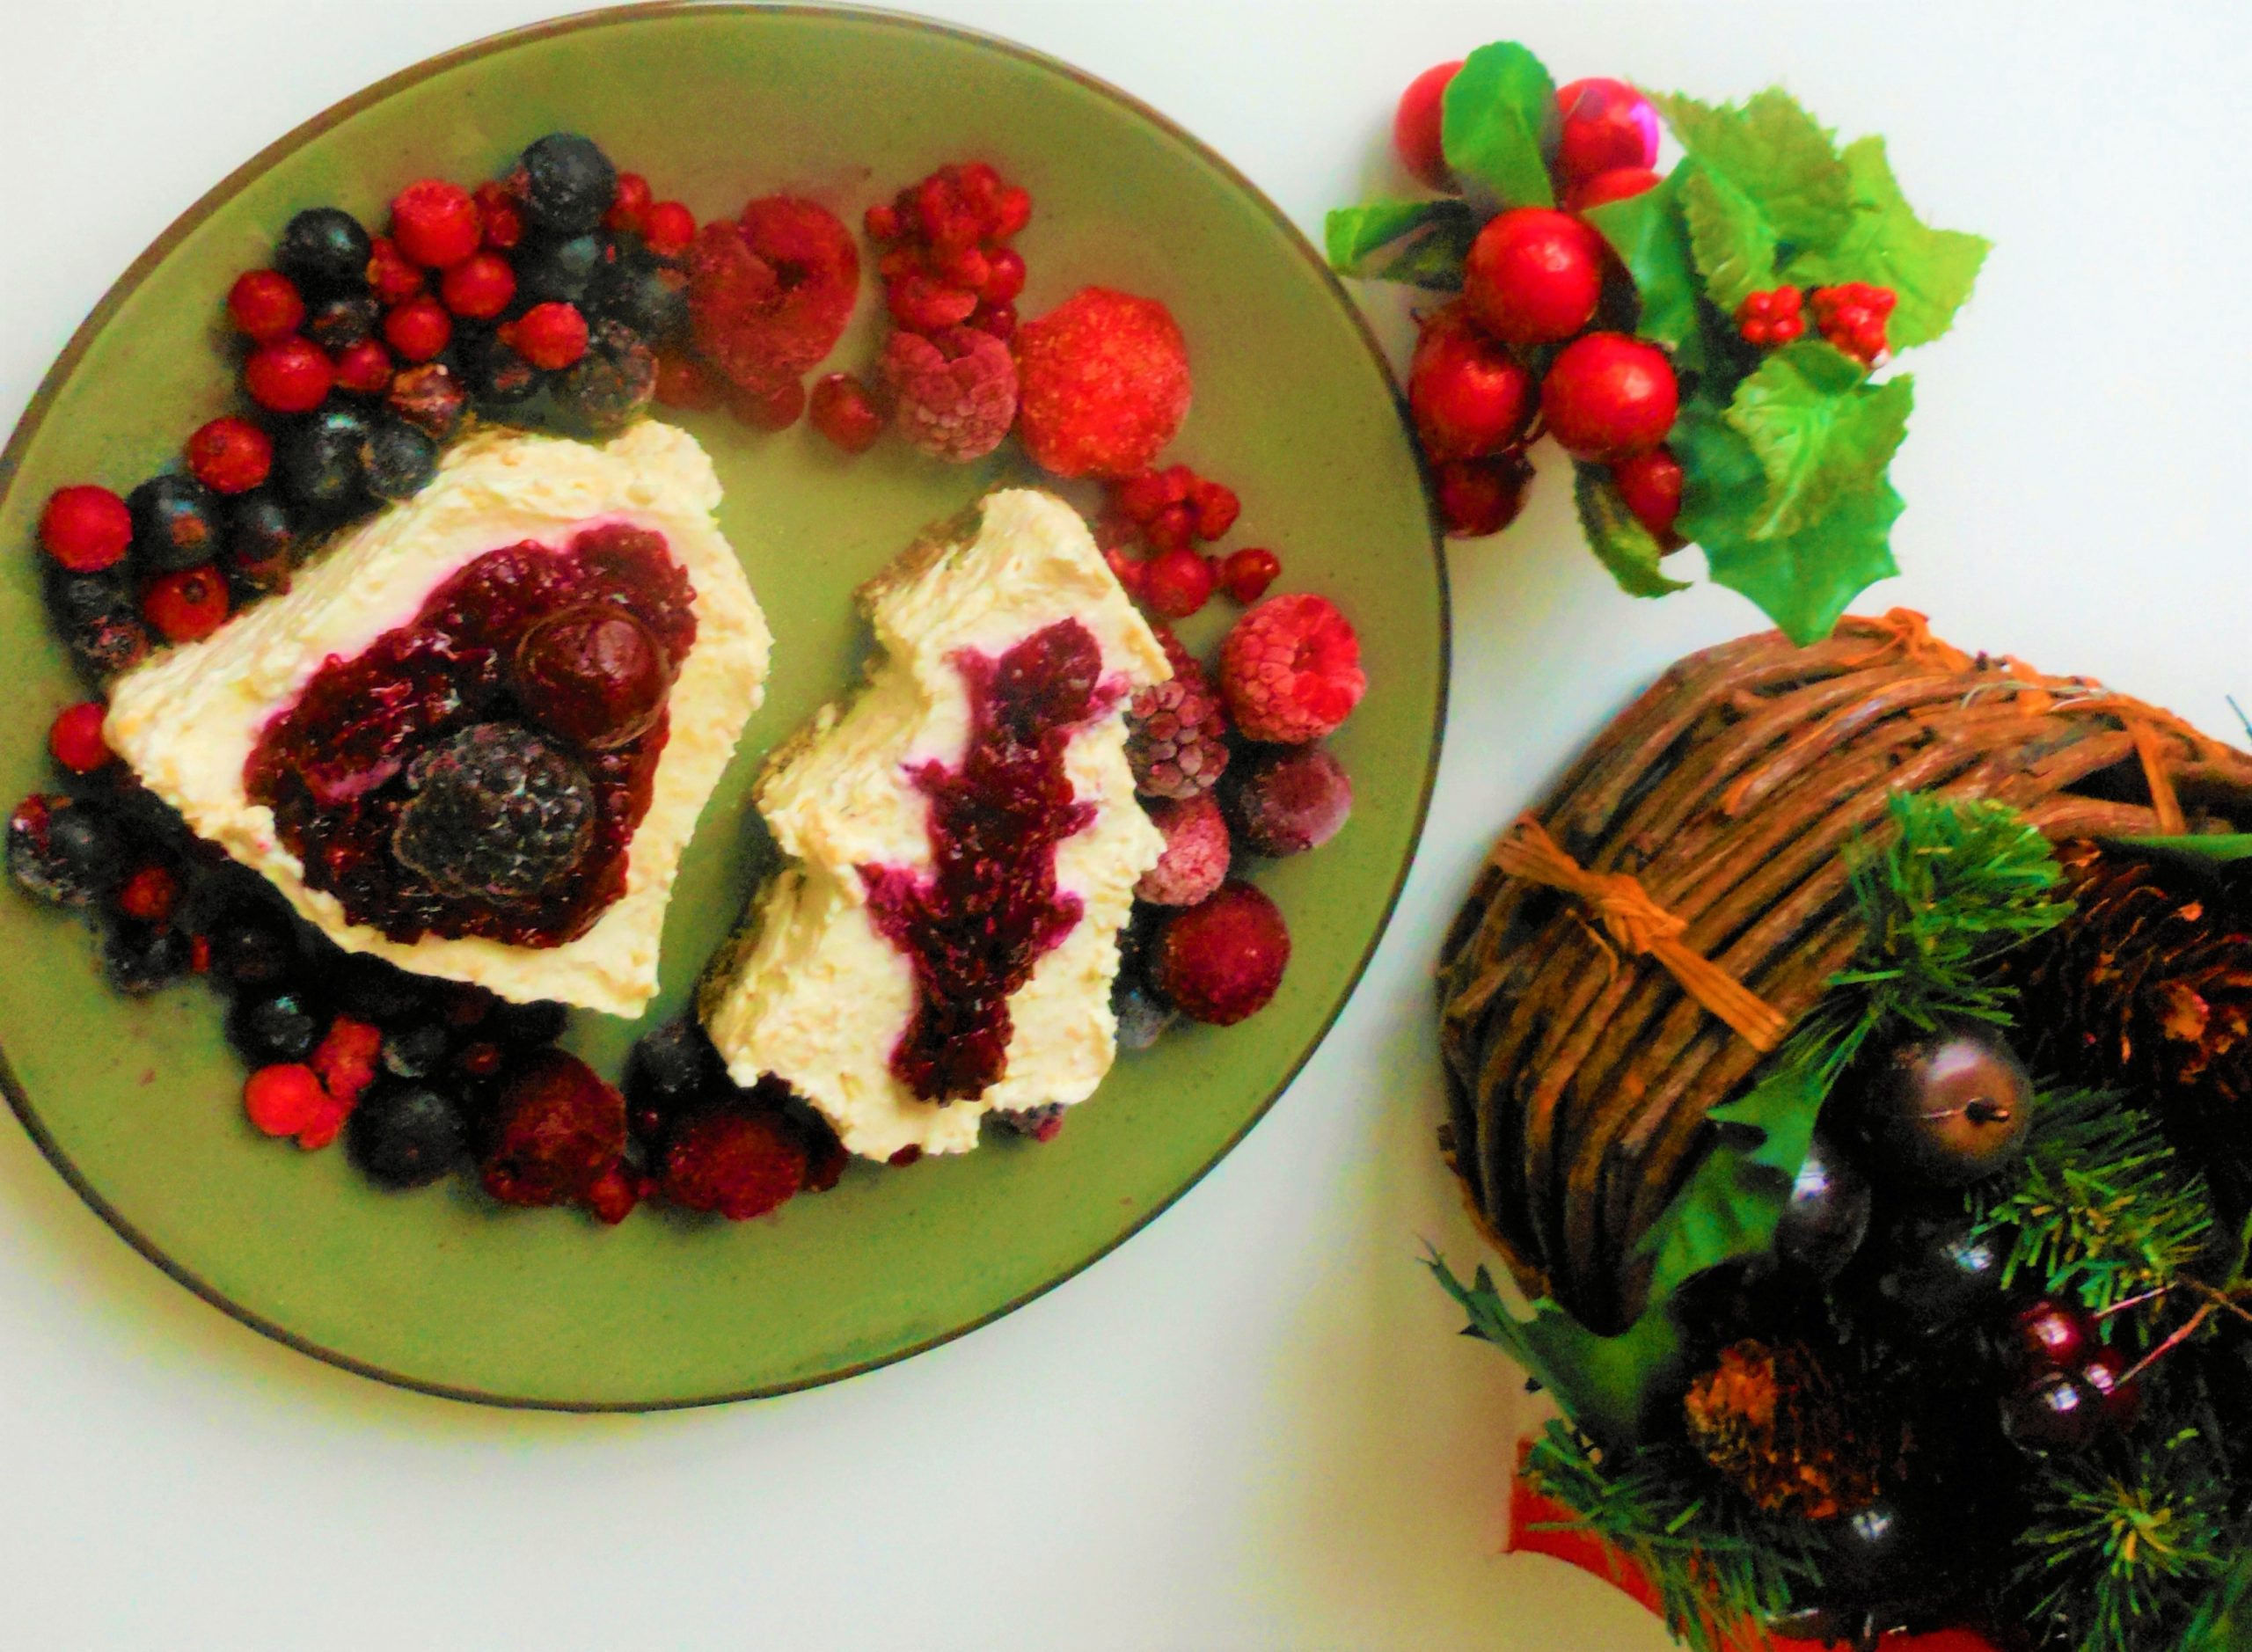 GELATINEVRIJE CHEESE CAKES